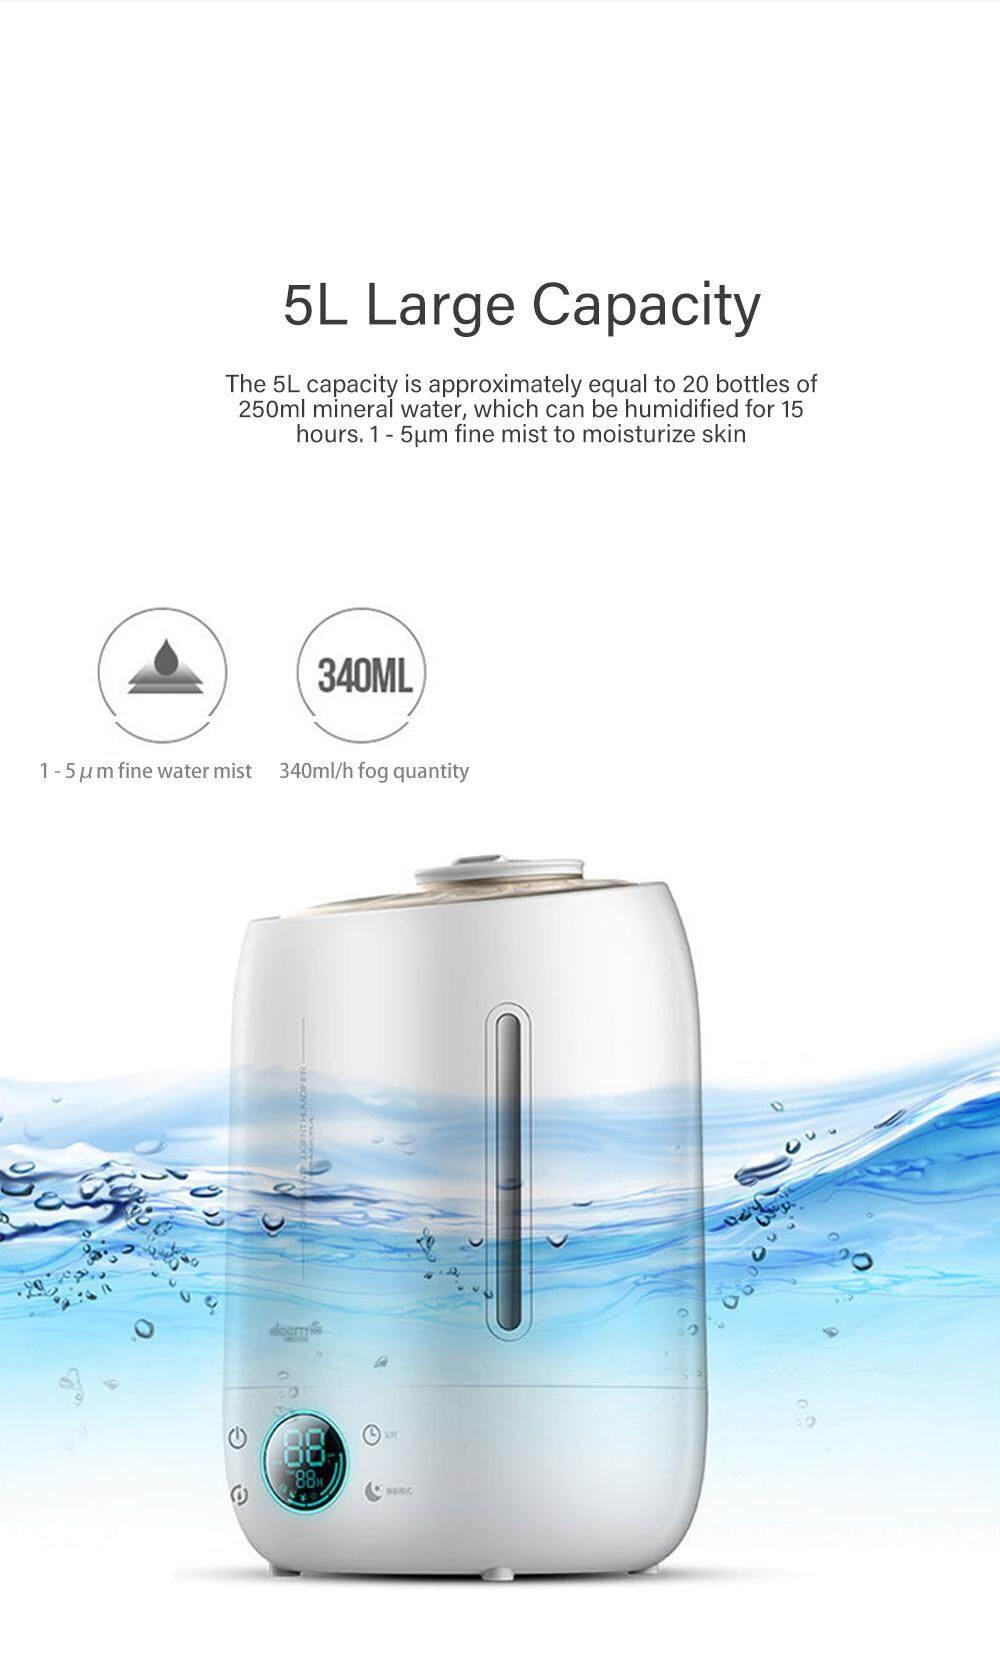 Deerma DEM - F500 Air Humidifier 5L Large Capacity Quiet Aroma Ultrasonic Fog Creator